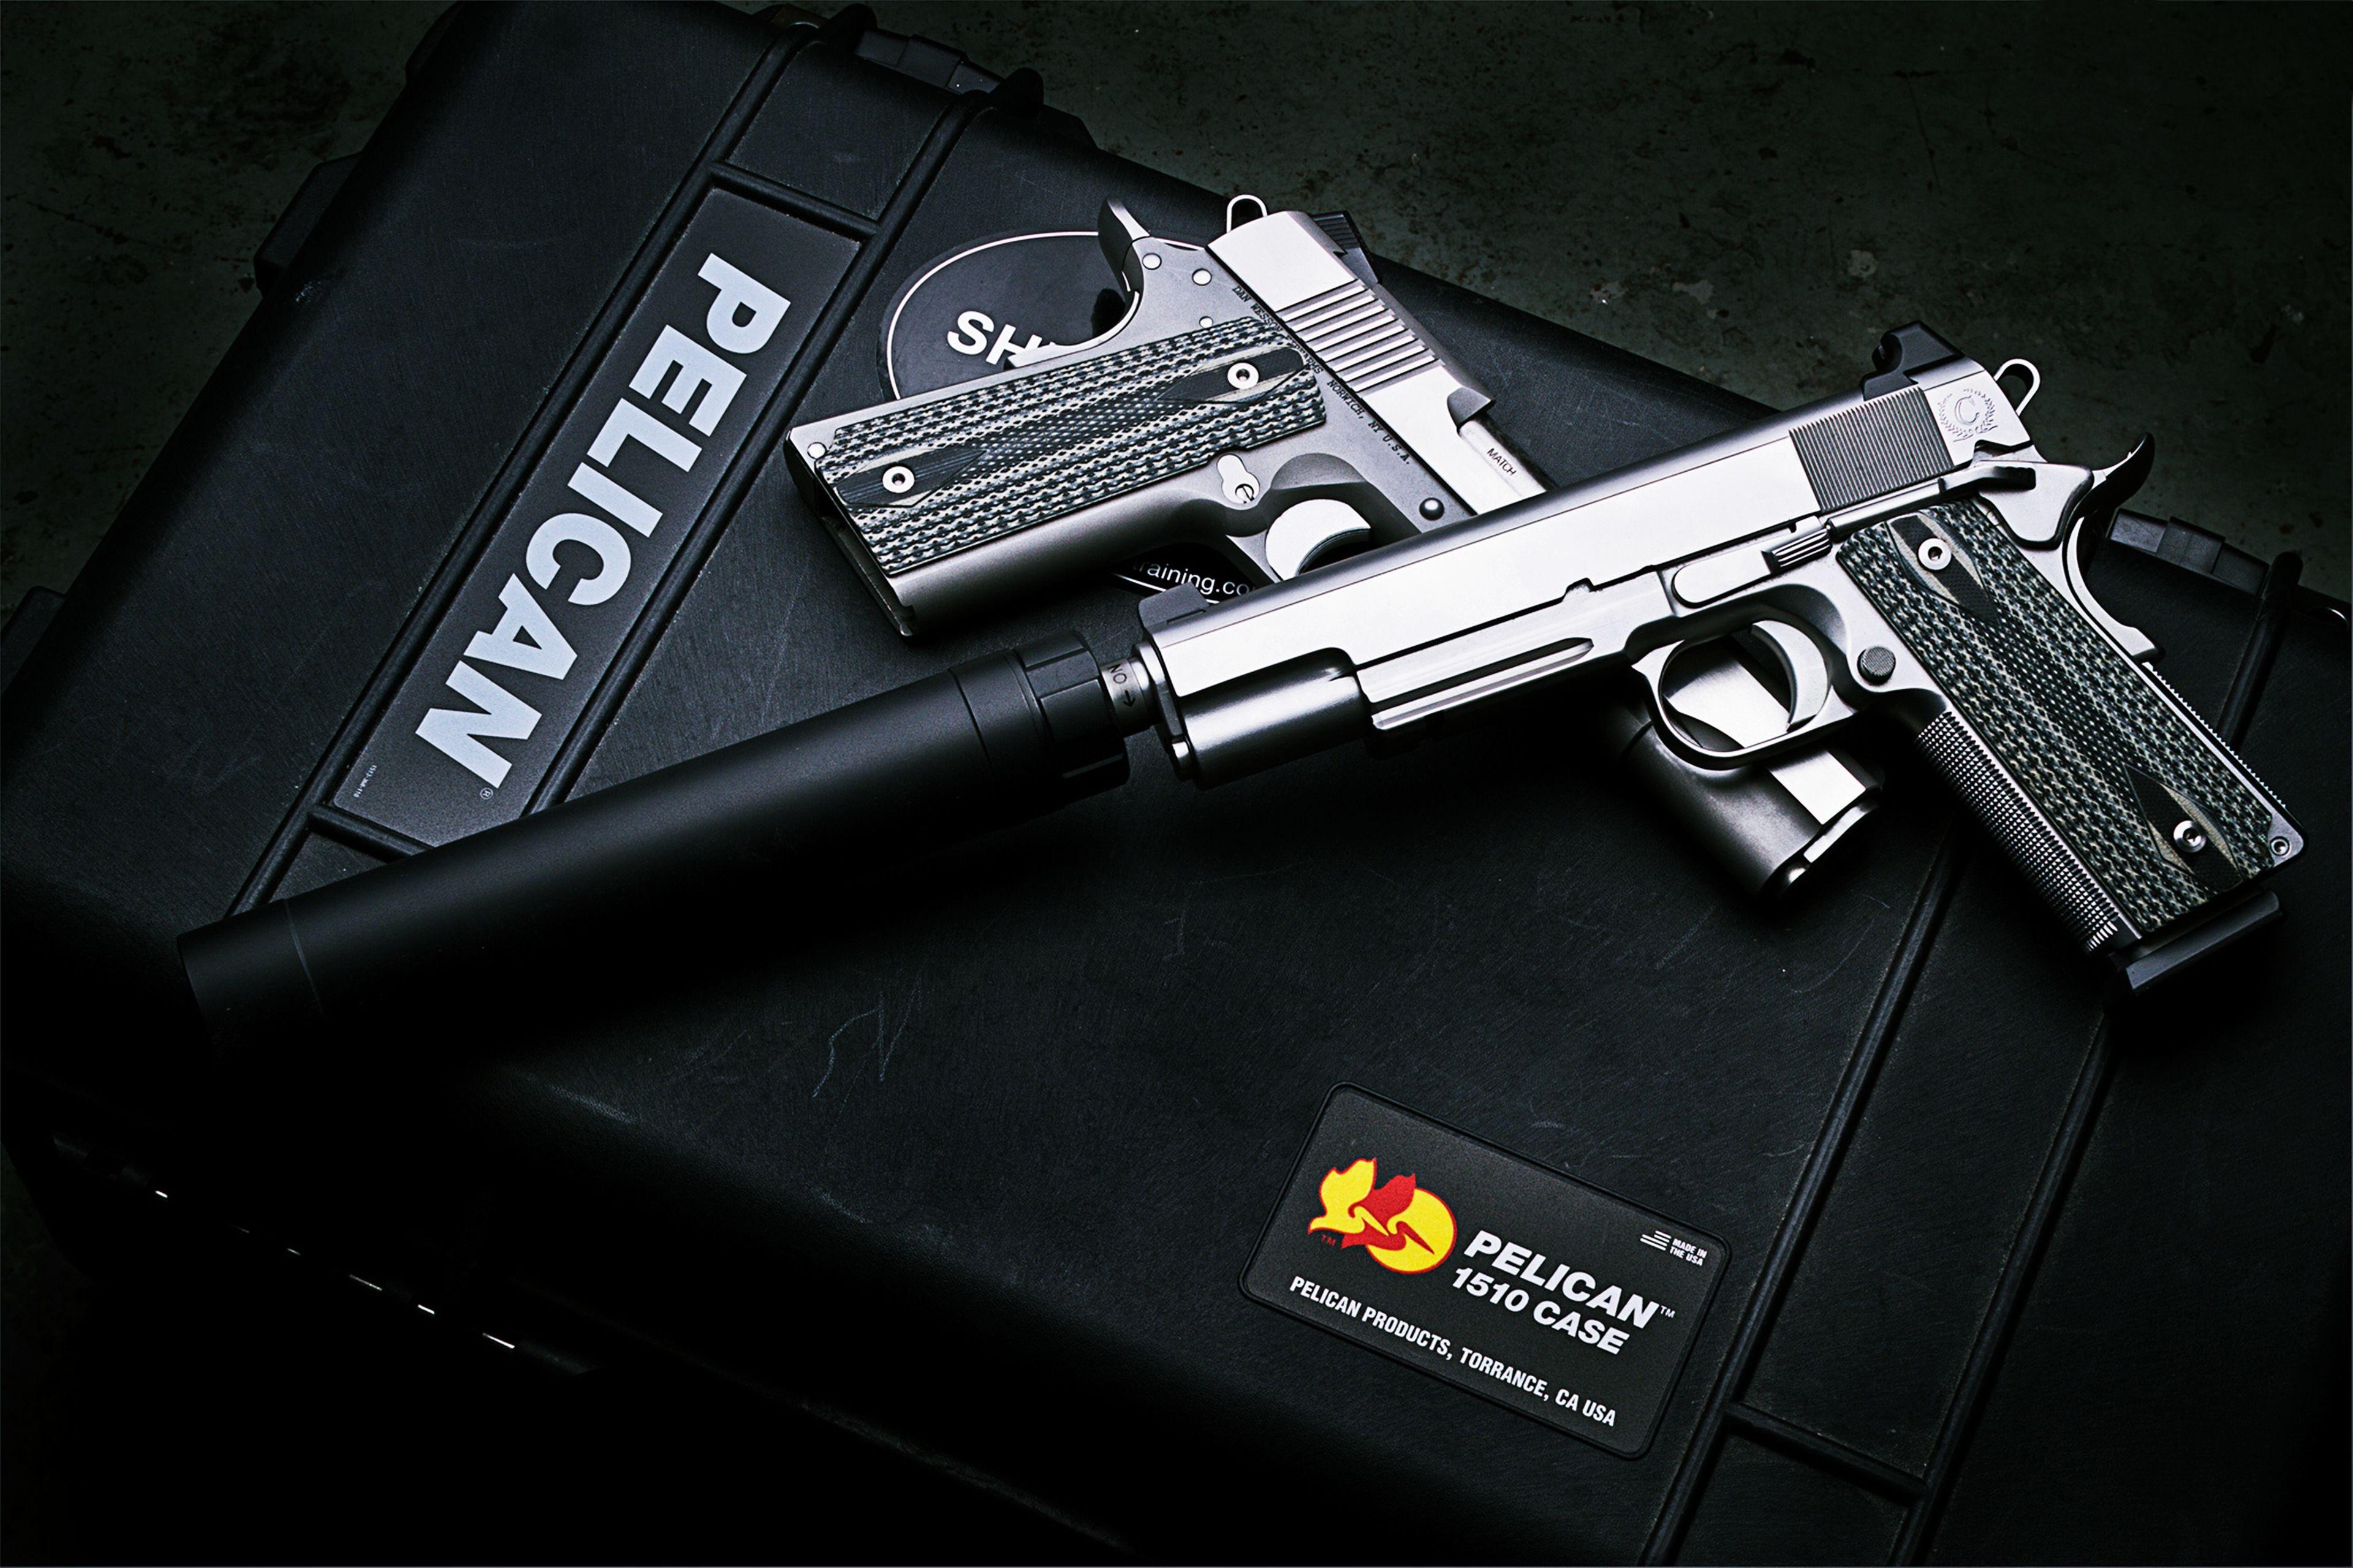 Police Theme Wallpaper Police M1911 Pistol case Hand guns 3840x2559